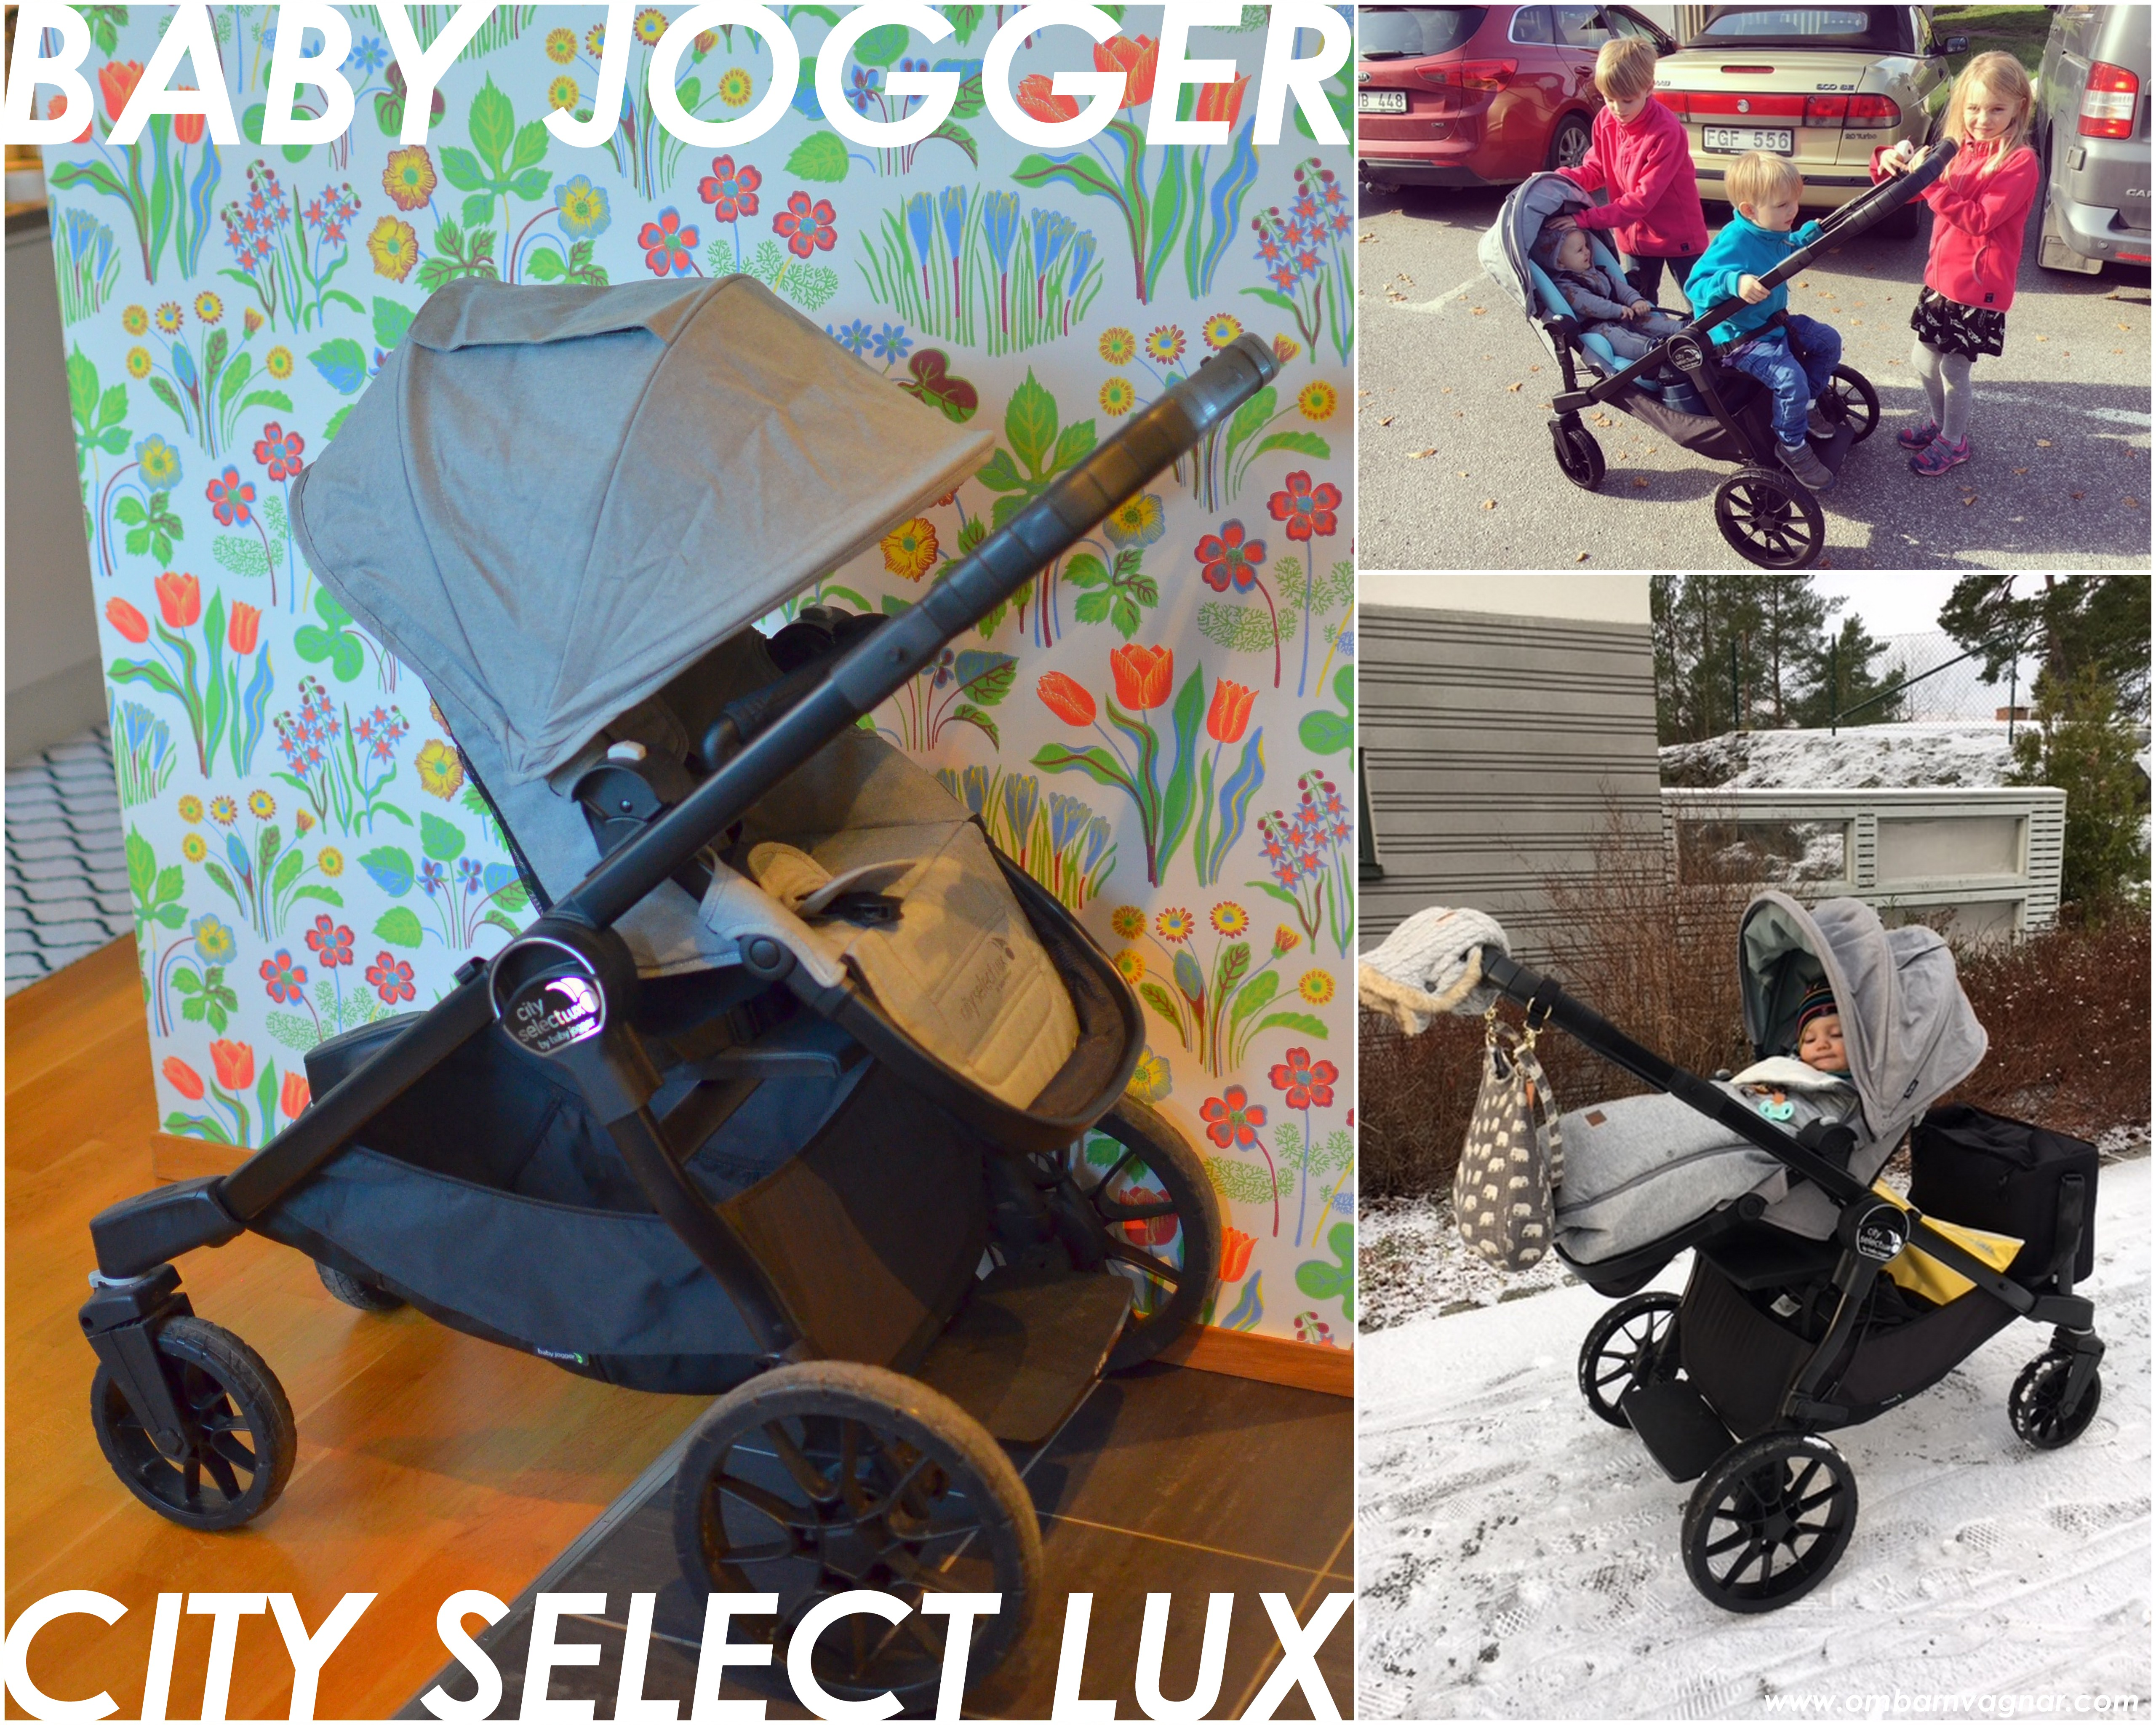 Recension av Baby Jogger City Select Lux